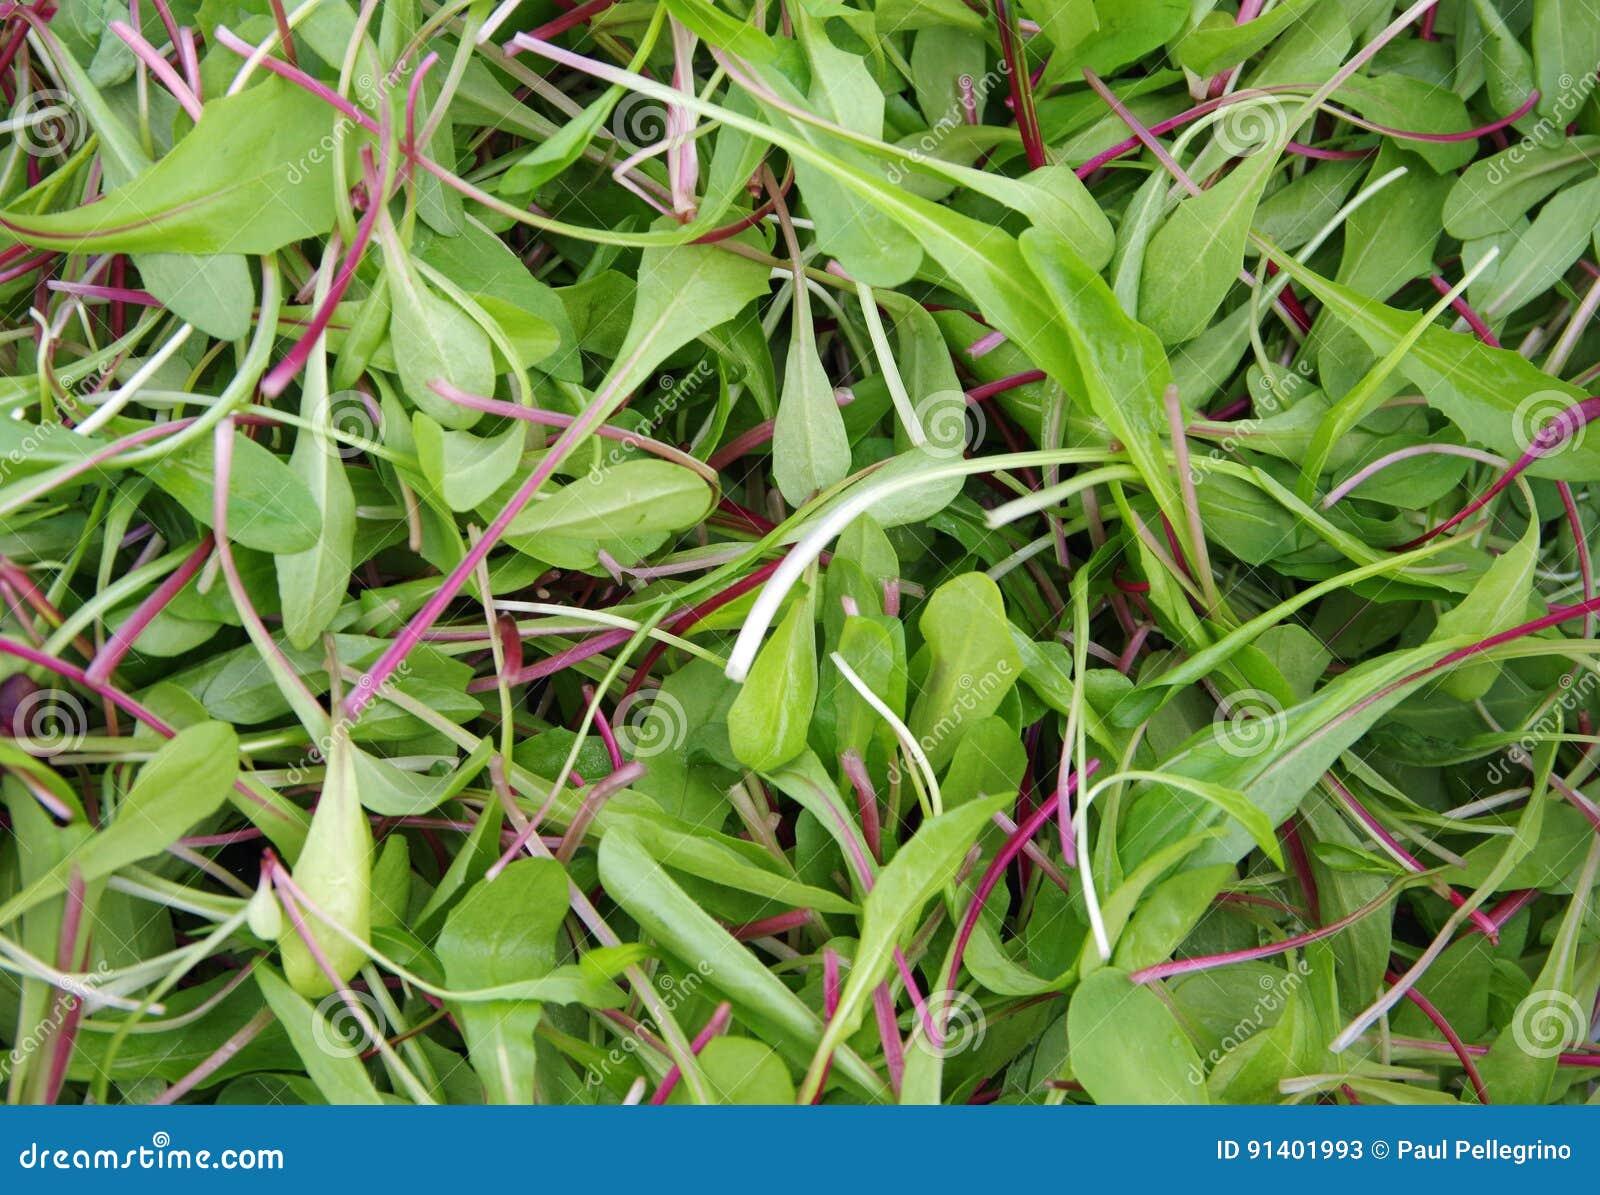 Verts frais de salade de coupe